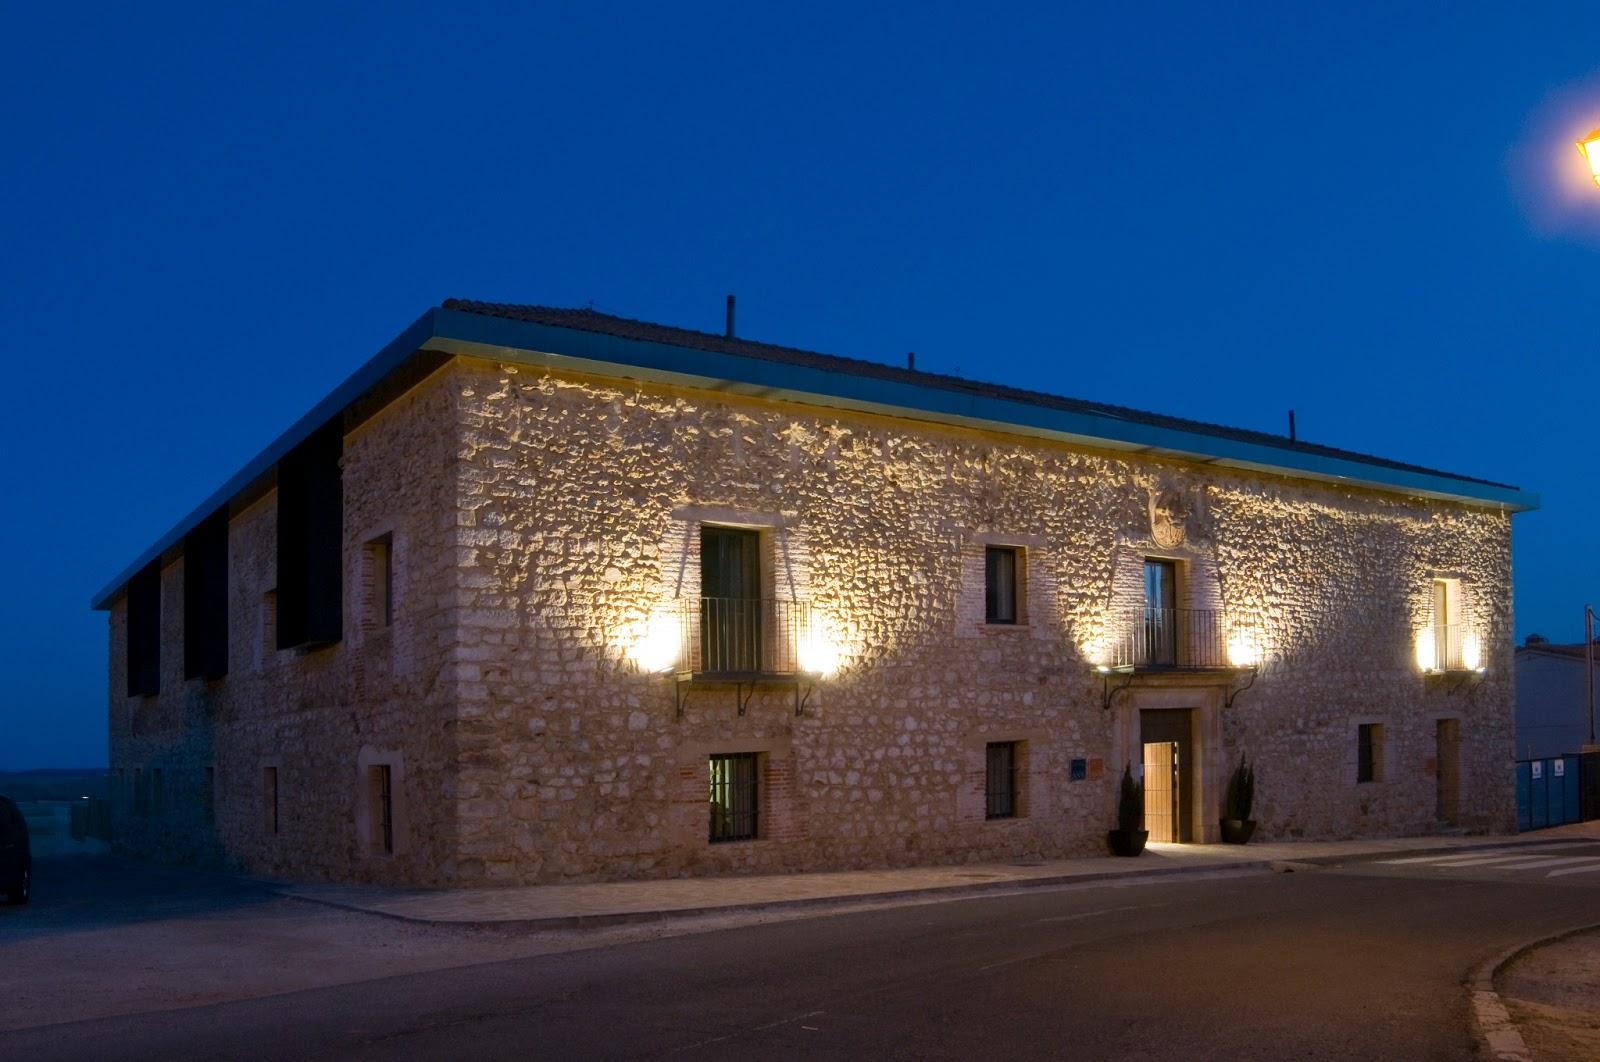 hoteles rurales en la provincia de guadalajara: